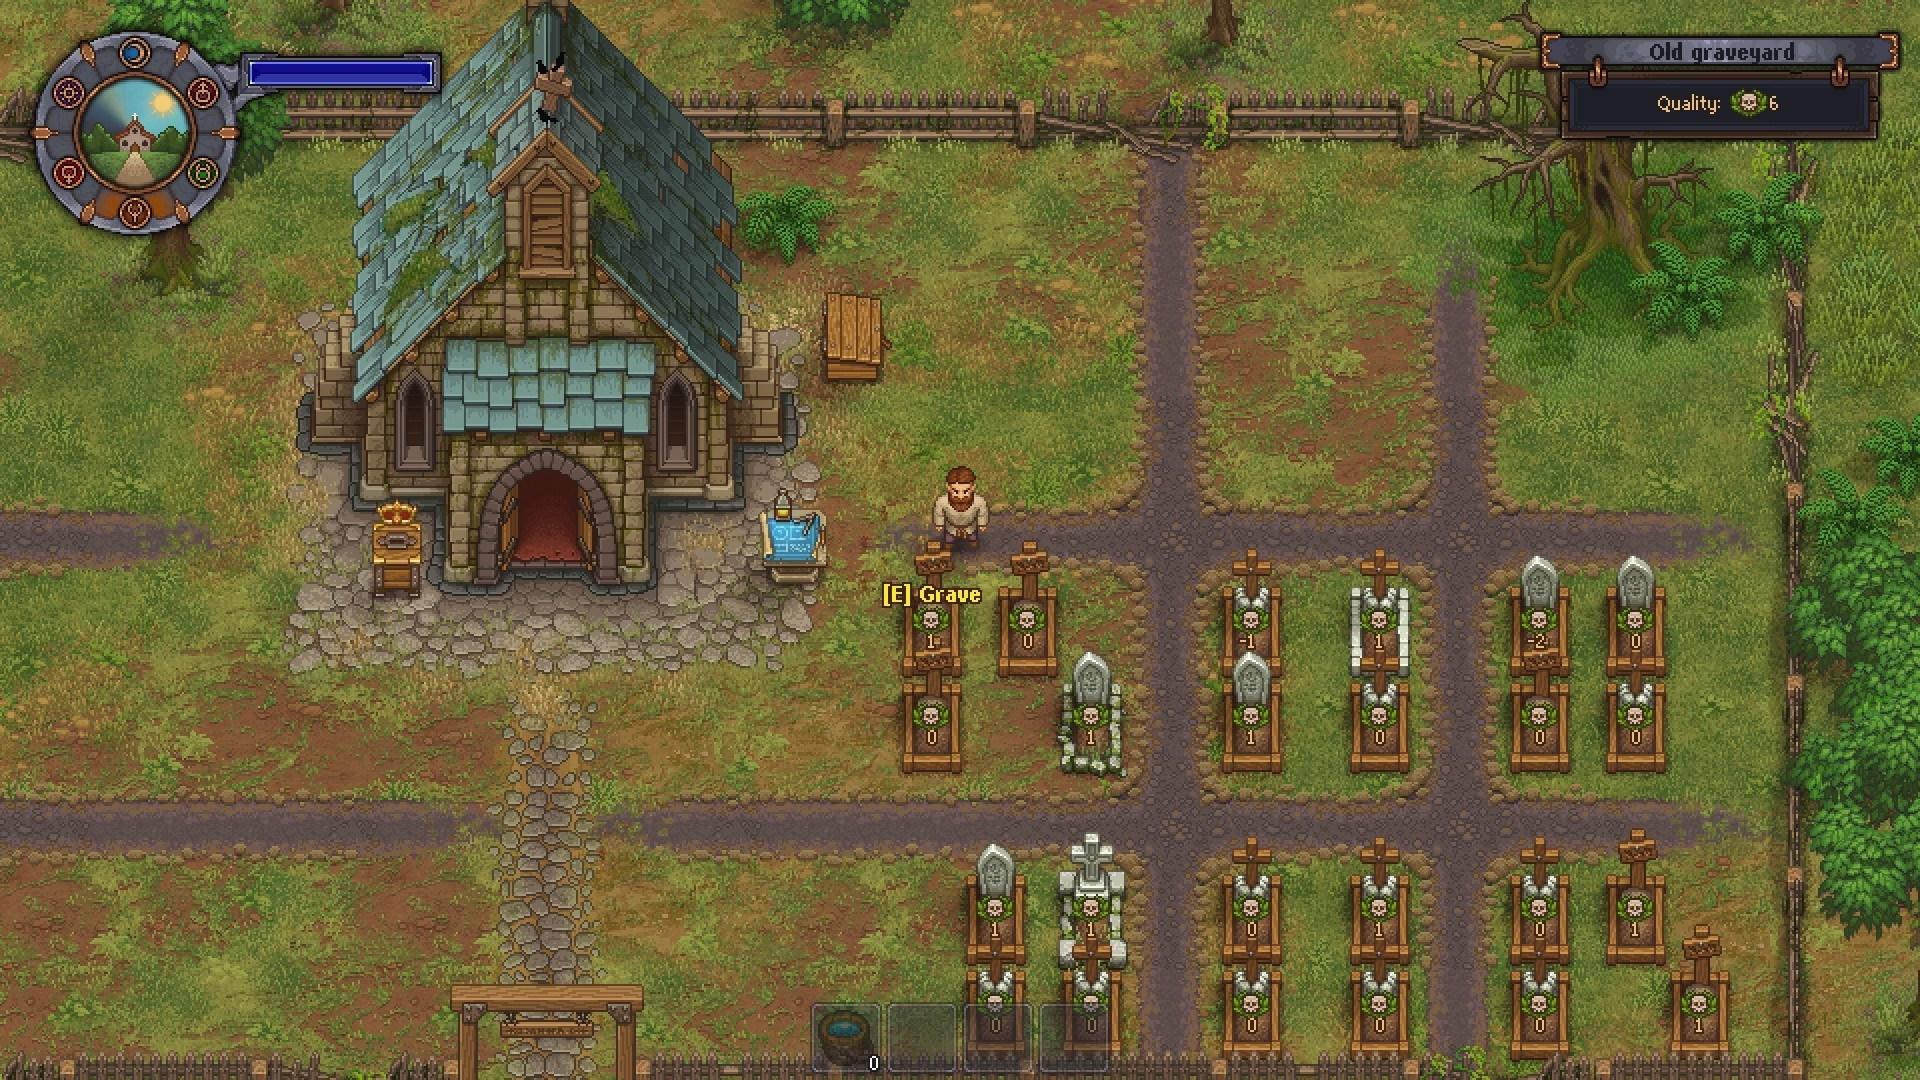 Graveyard Keeper - Graveyard